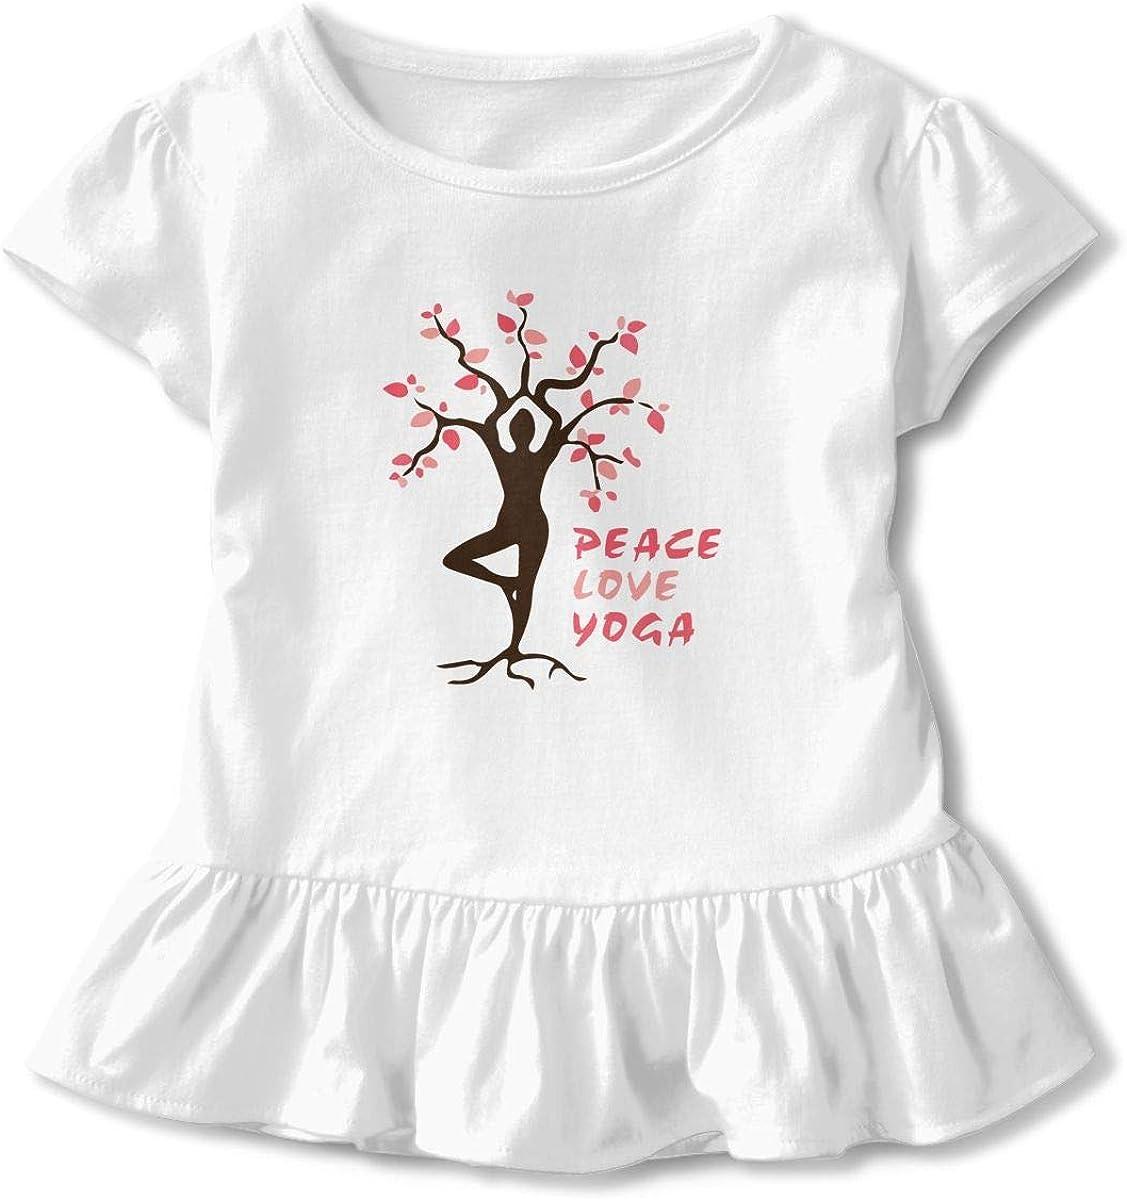 Peace Love Yoga Toddler Girls T Shirt Kids Cotton Short Sleeve Ruffle Tee